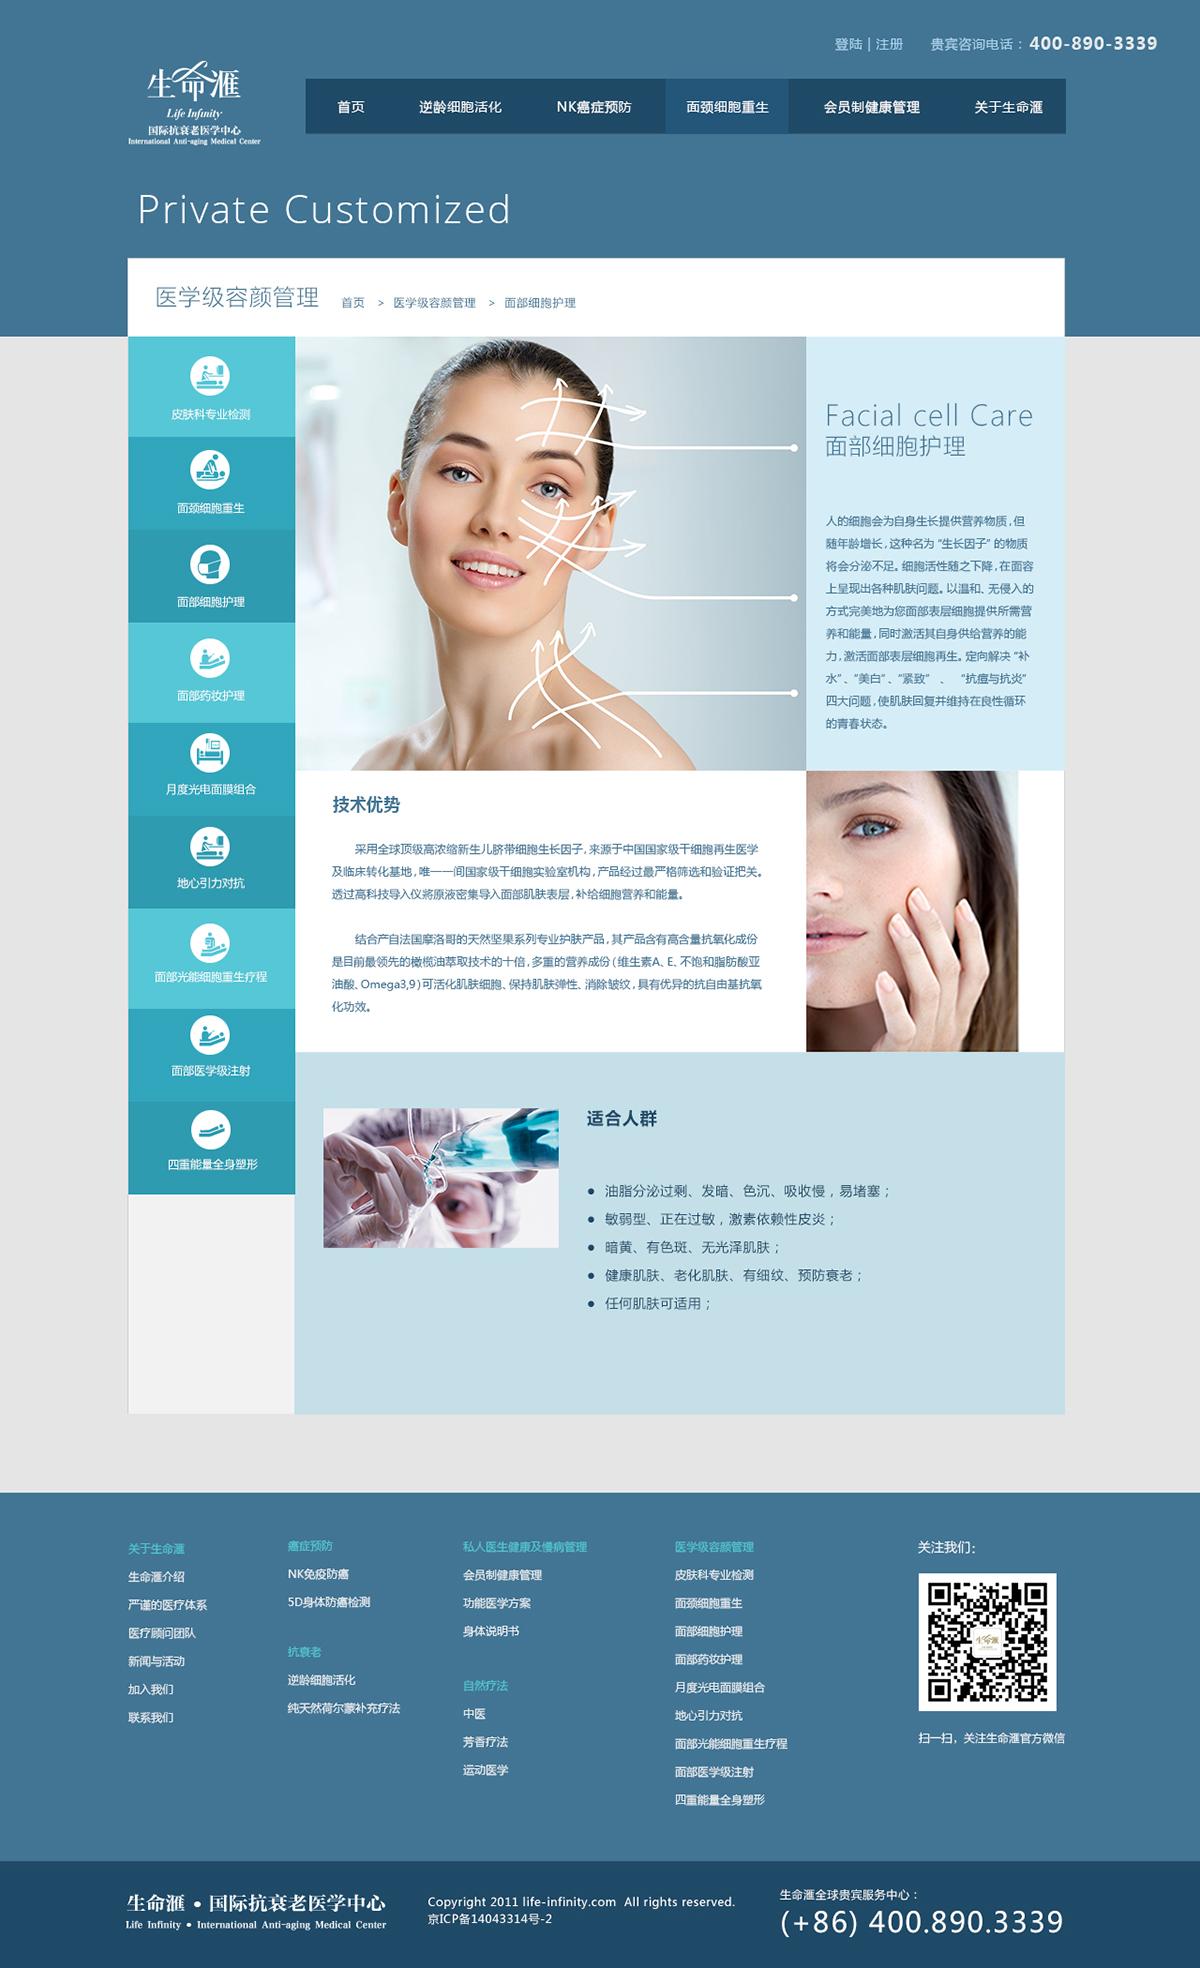 Web UI hospital design Catalogue 官网 网站 抗衰老 医疗